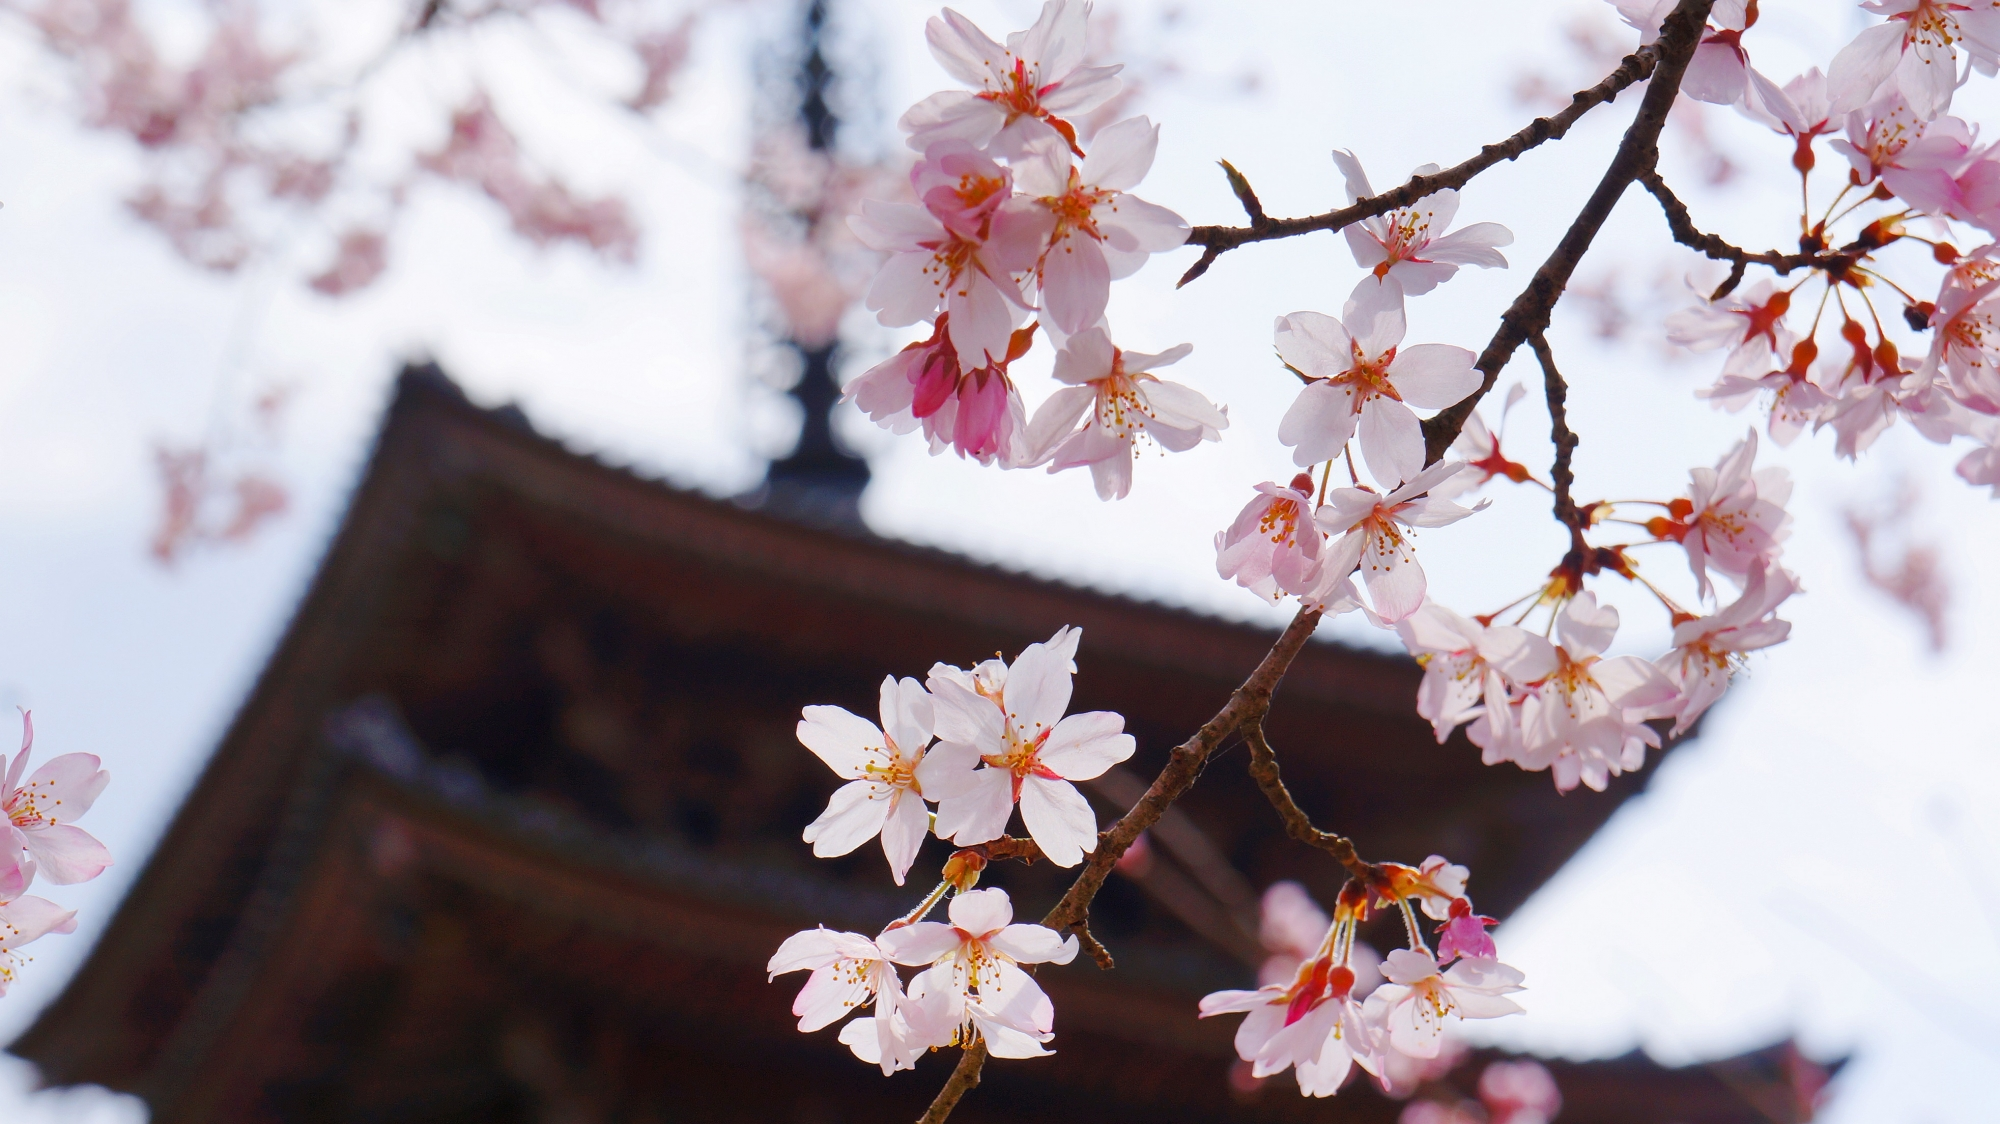 Kyoto Daigoji-Temple Five-story pagoda cherry blossoms spring 桜 醍醐寺 五重塔